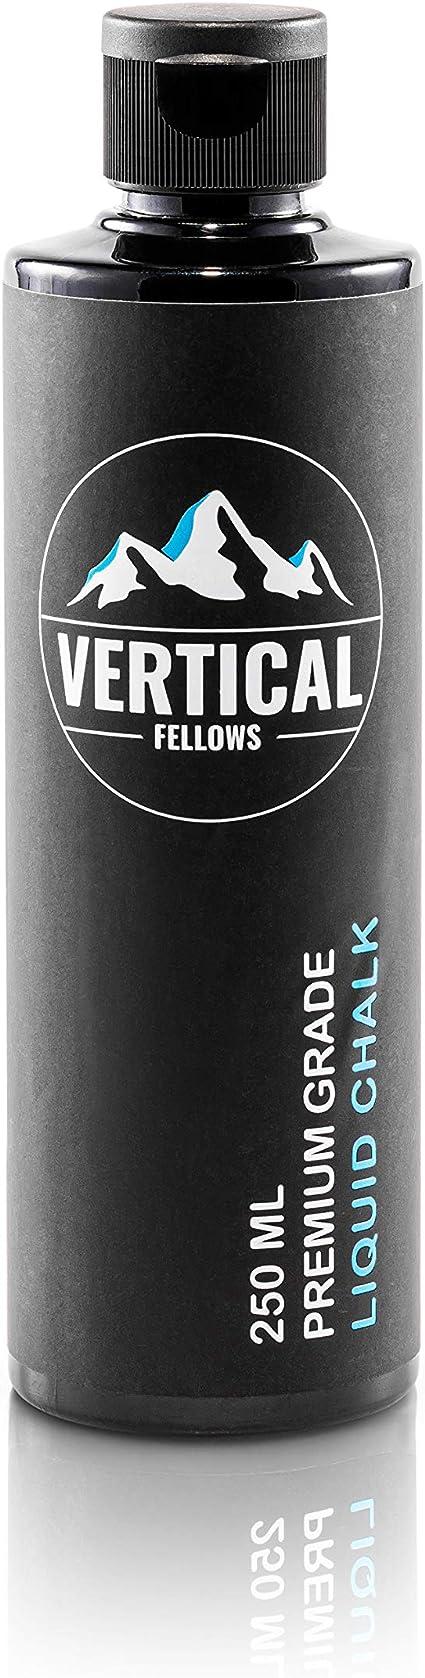 Vertical Fellows Liquid Chalk Tiza líquida para escalada, pesas ...